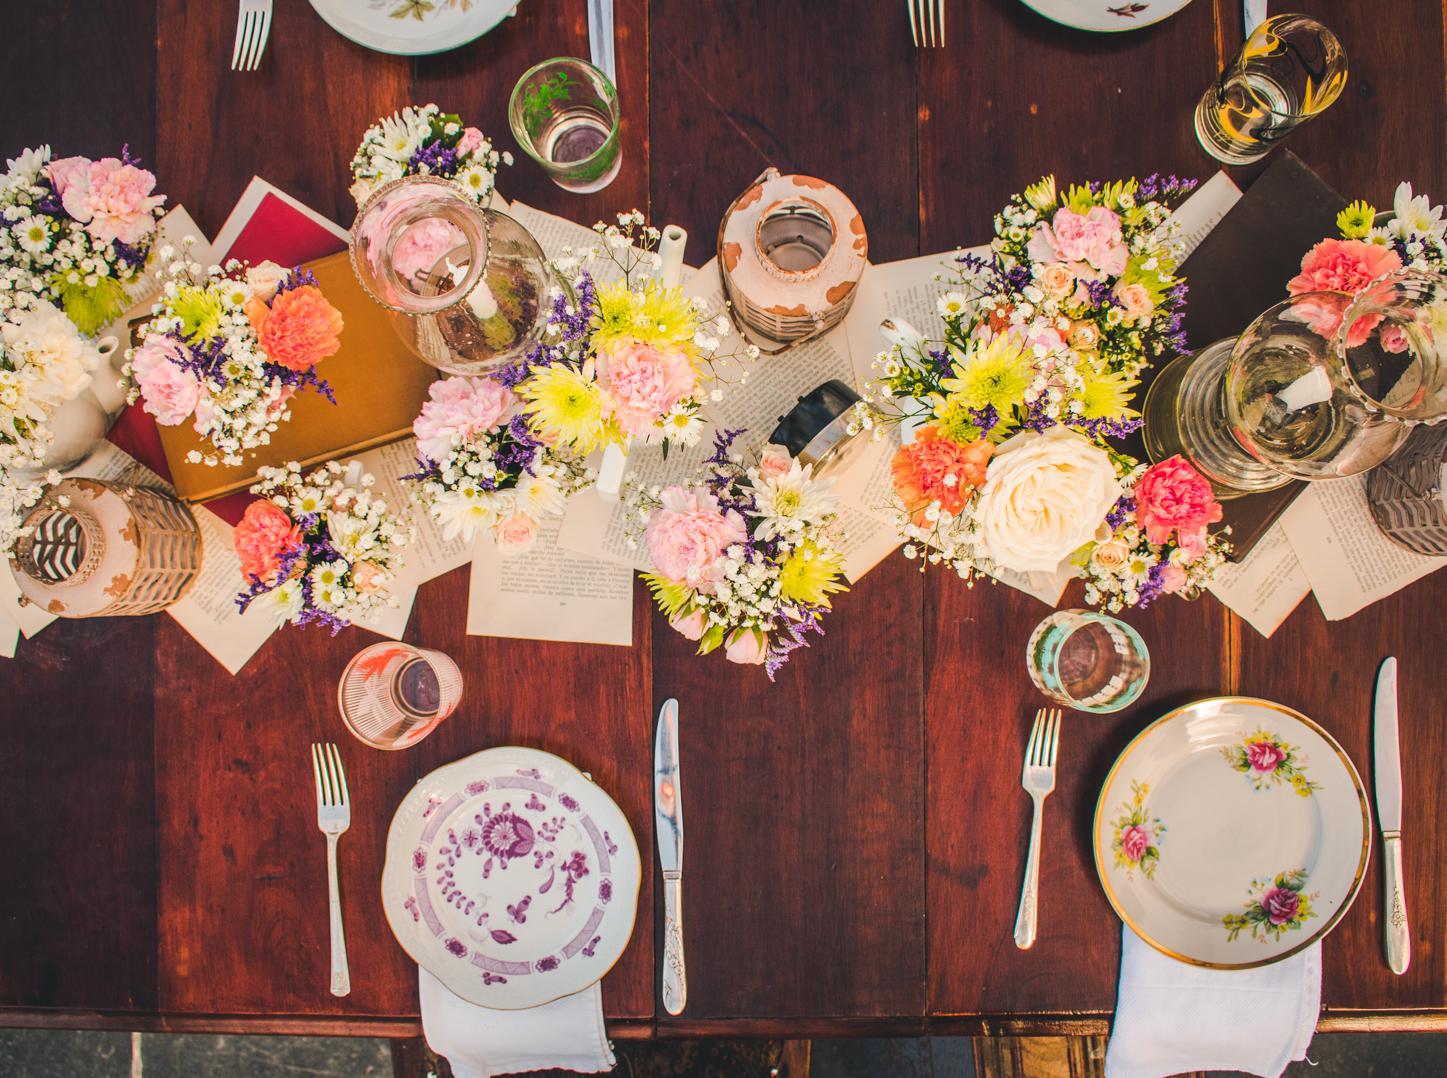 bodas-sin-clasificar-sin-tema-cuba-42501.jpg